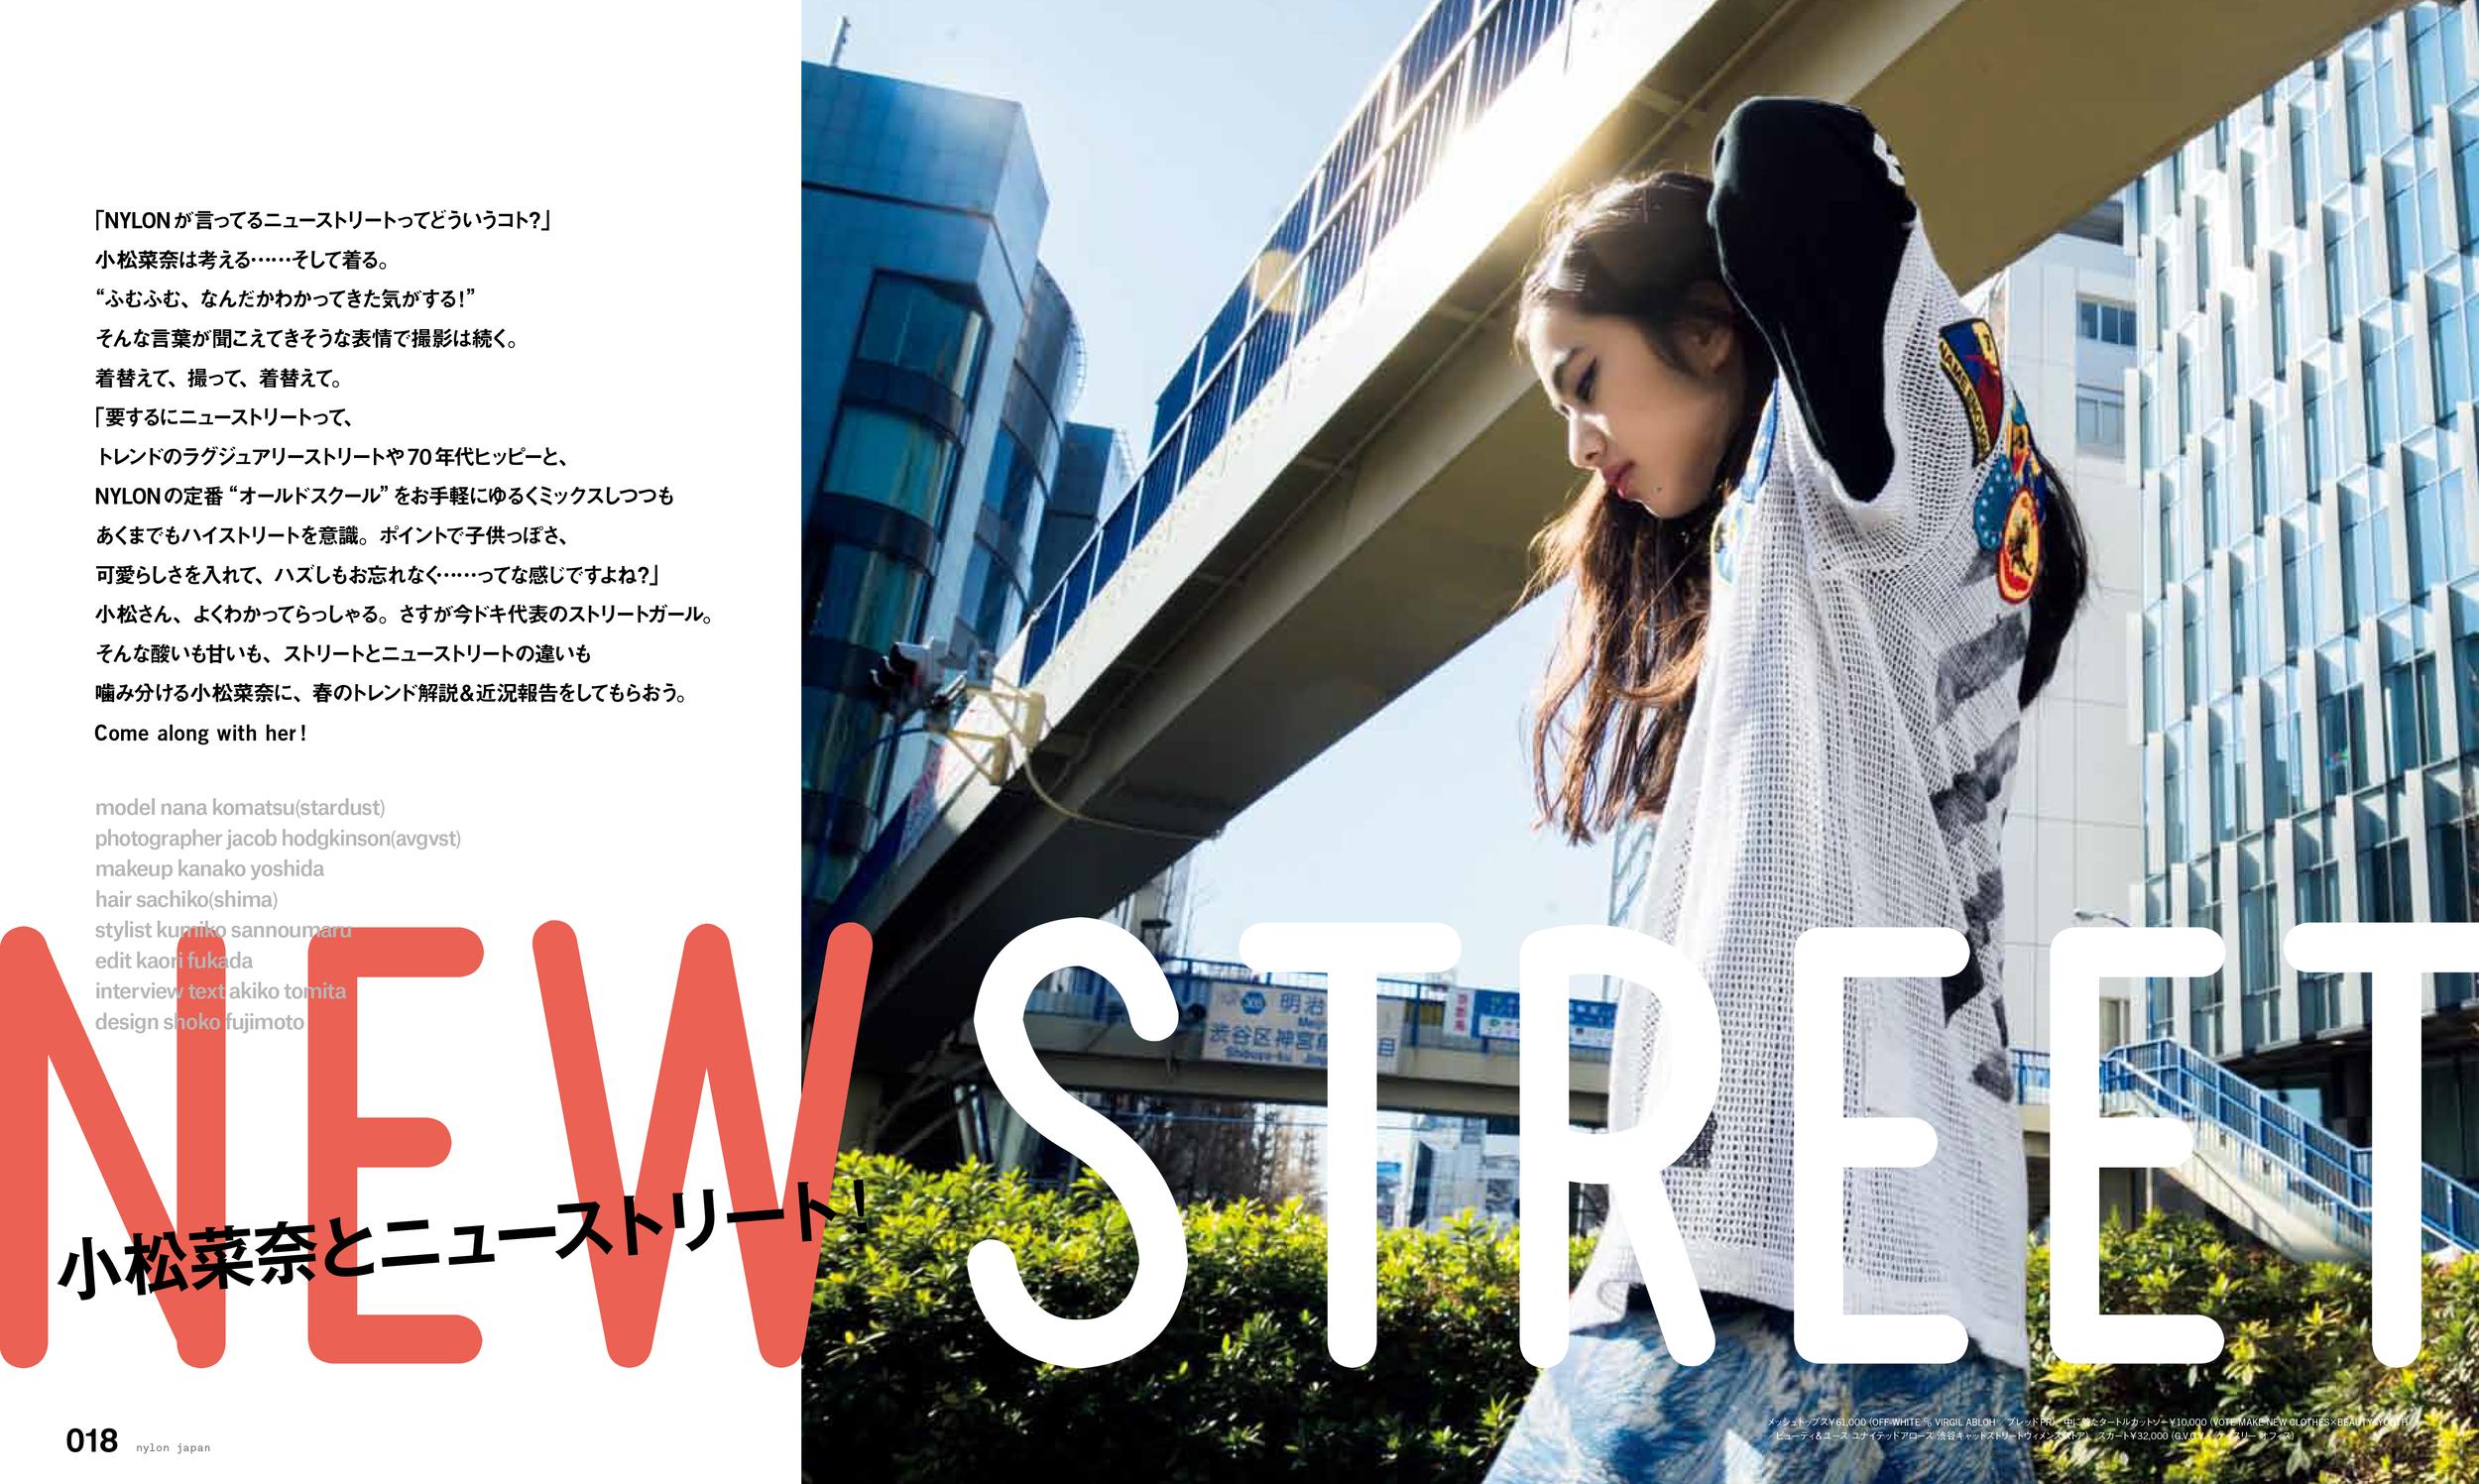 P000-000_NANA _STORY責-1.jpg